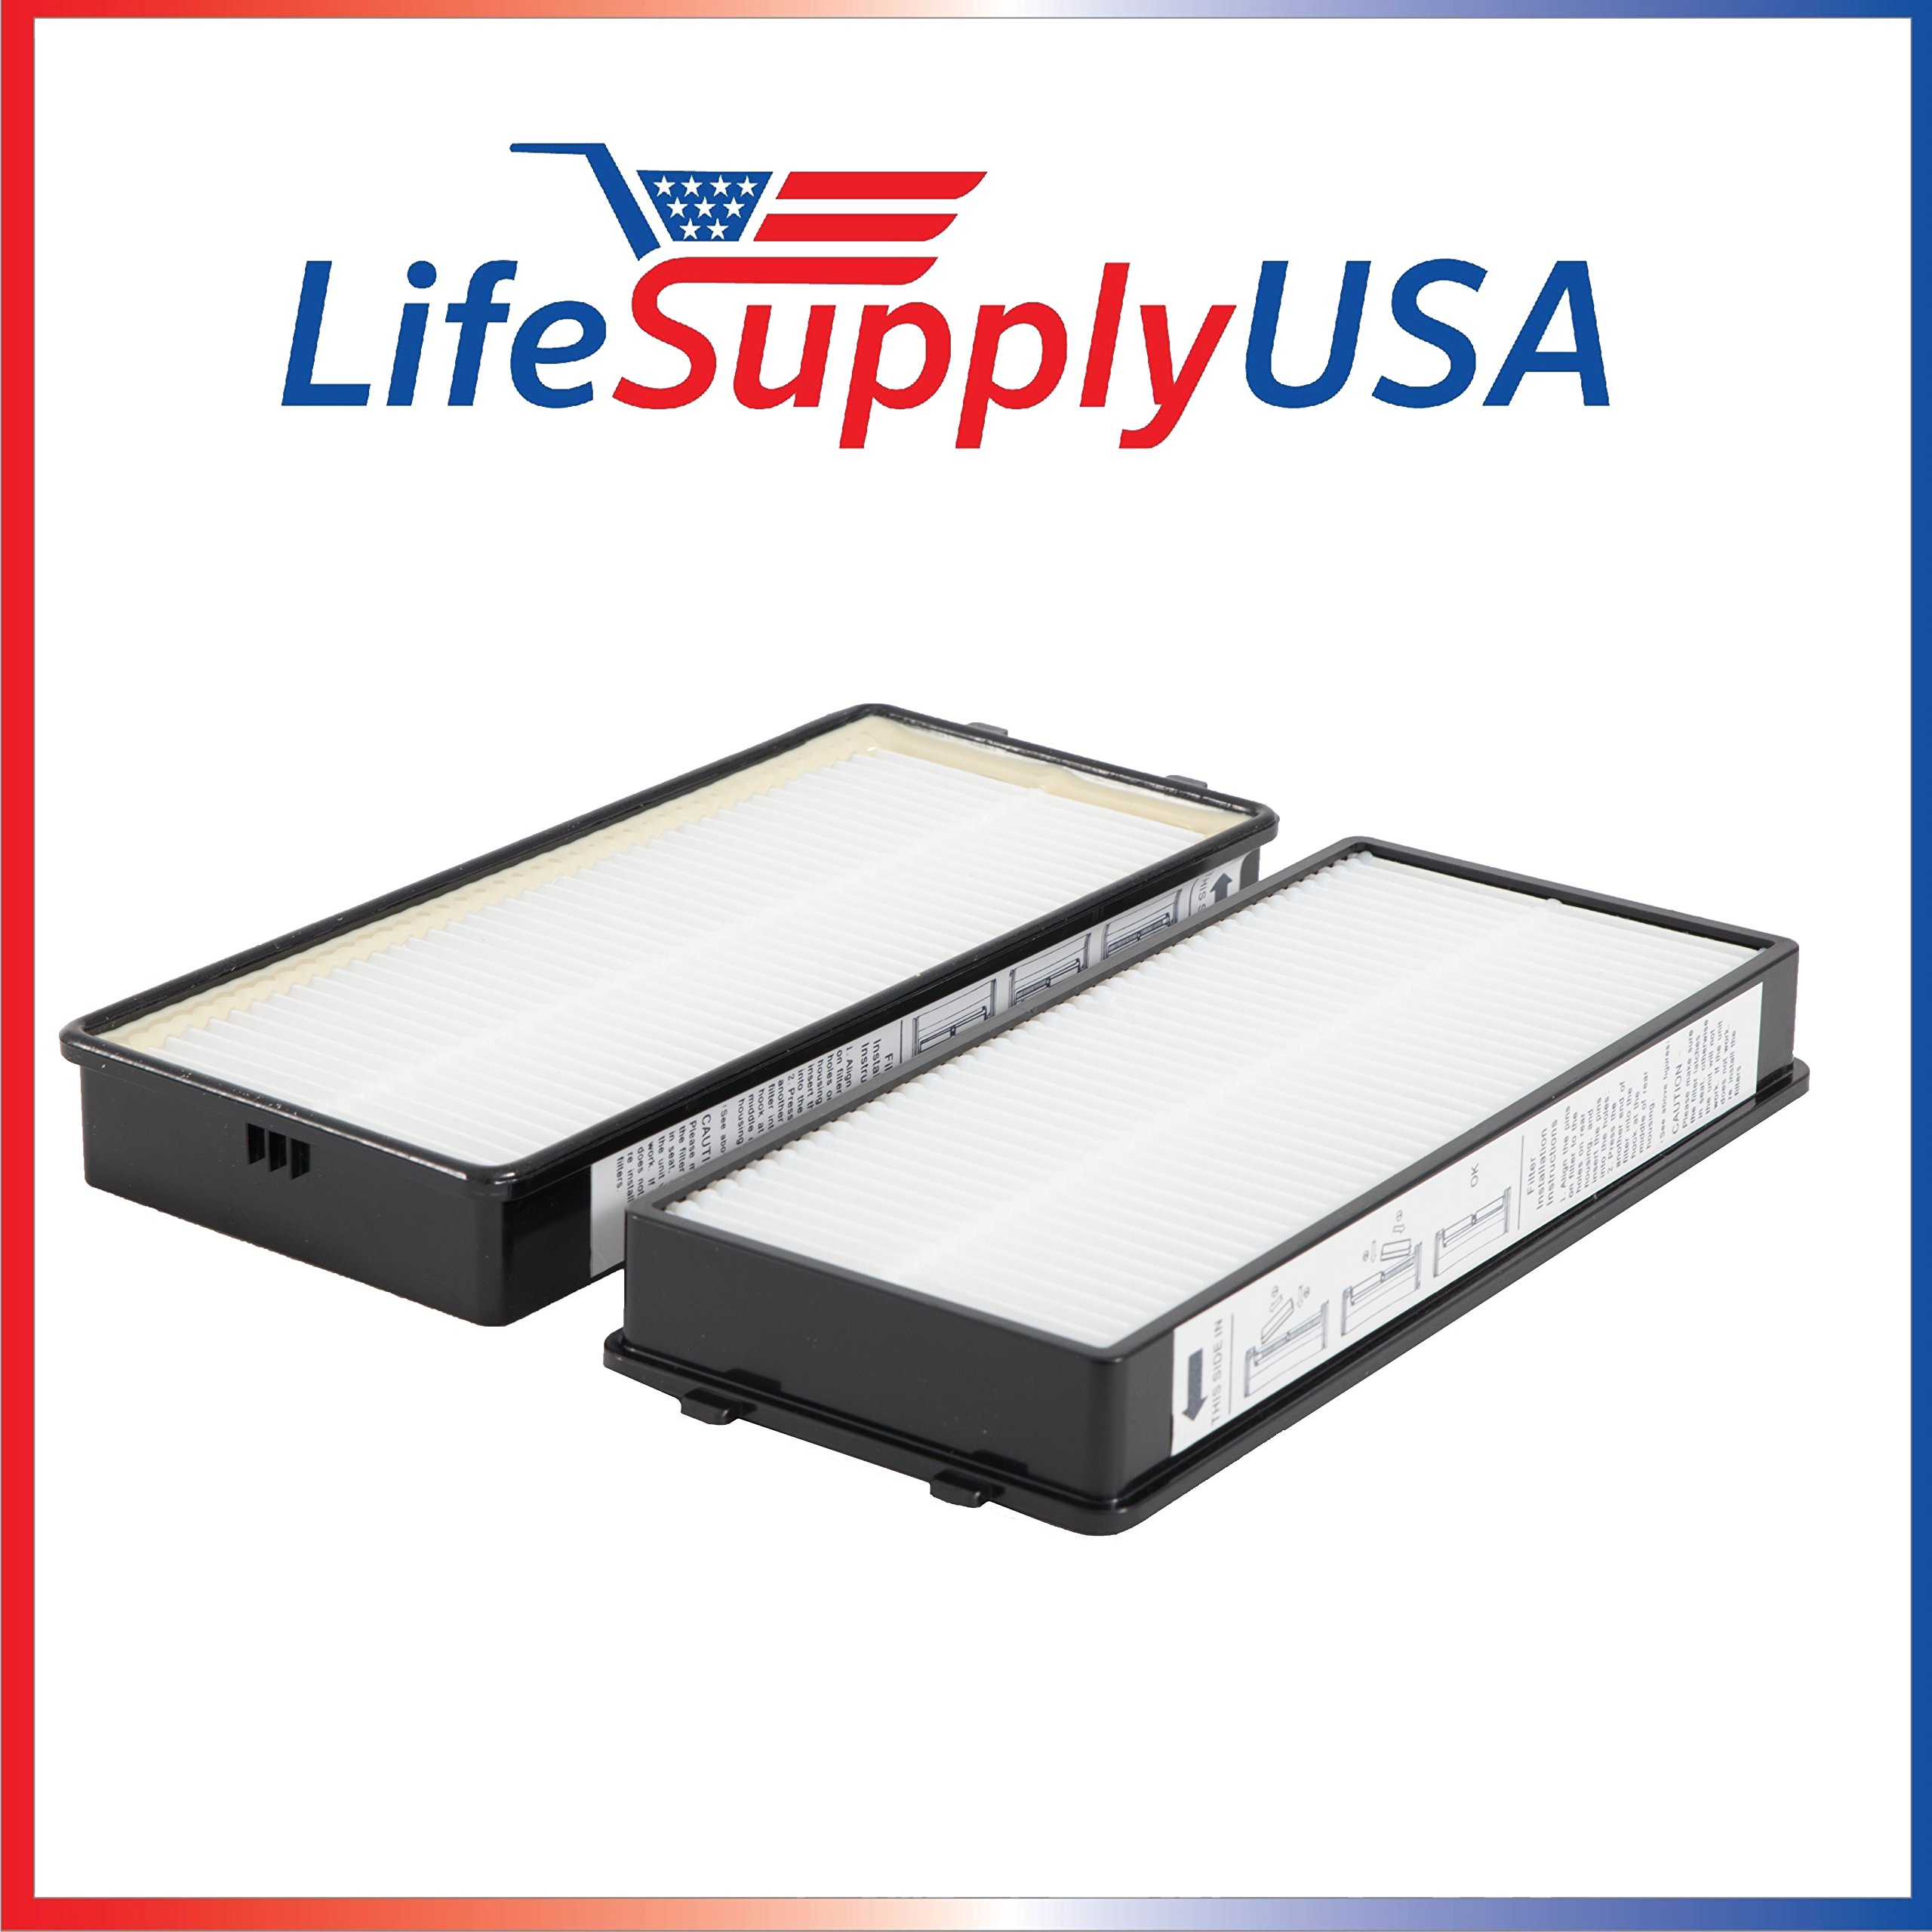 Replacement Hepa Air Filter Set Fits Homedics AR-OTFL AR-15, AR-25, AR-35 and AR-45 - By LifeSupplyUSA